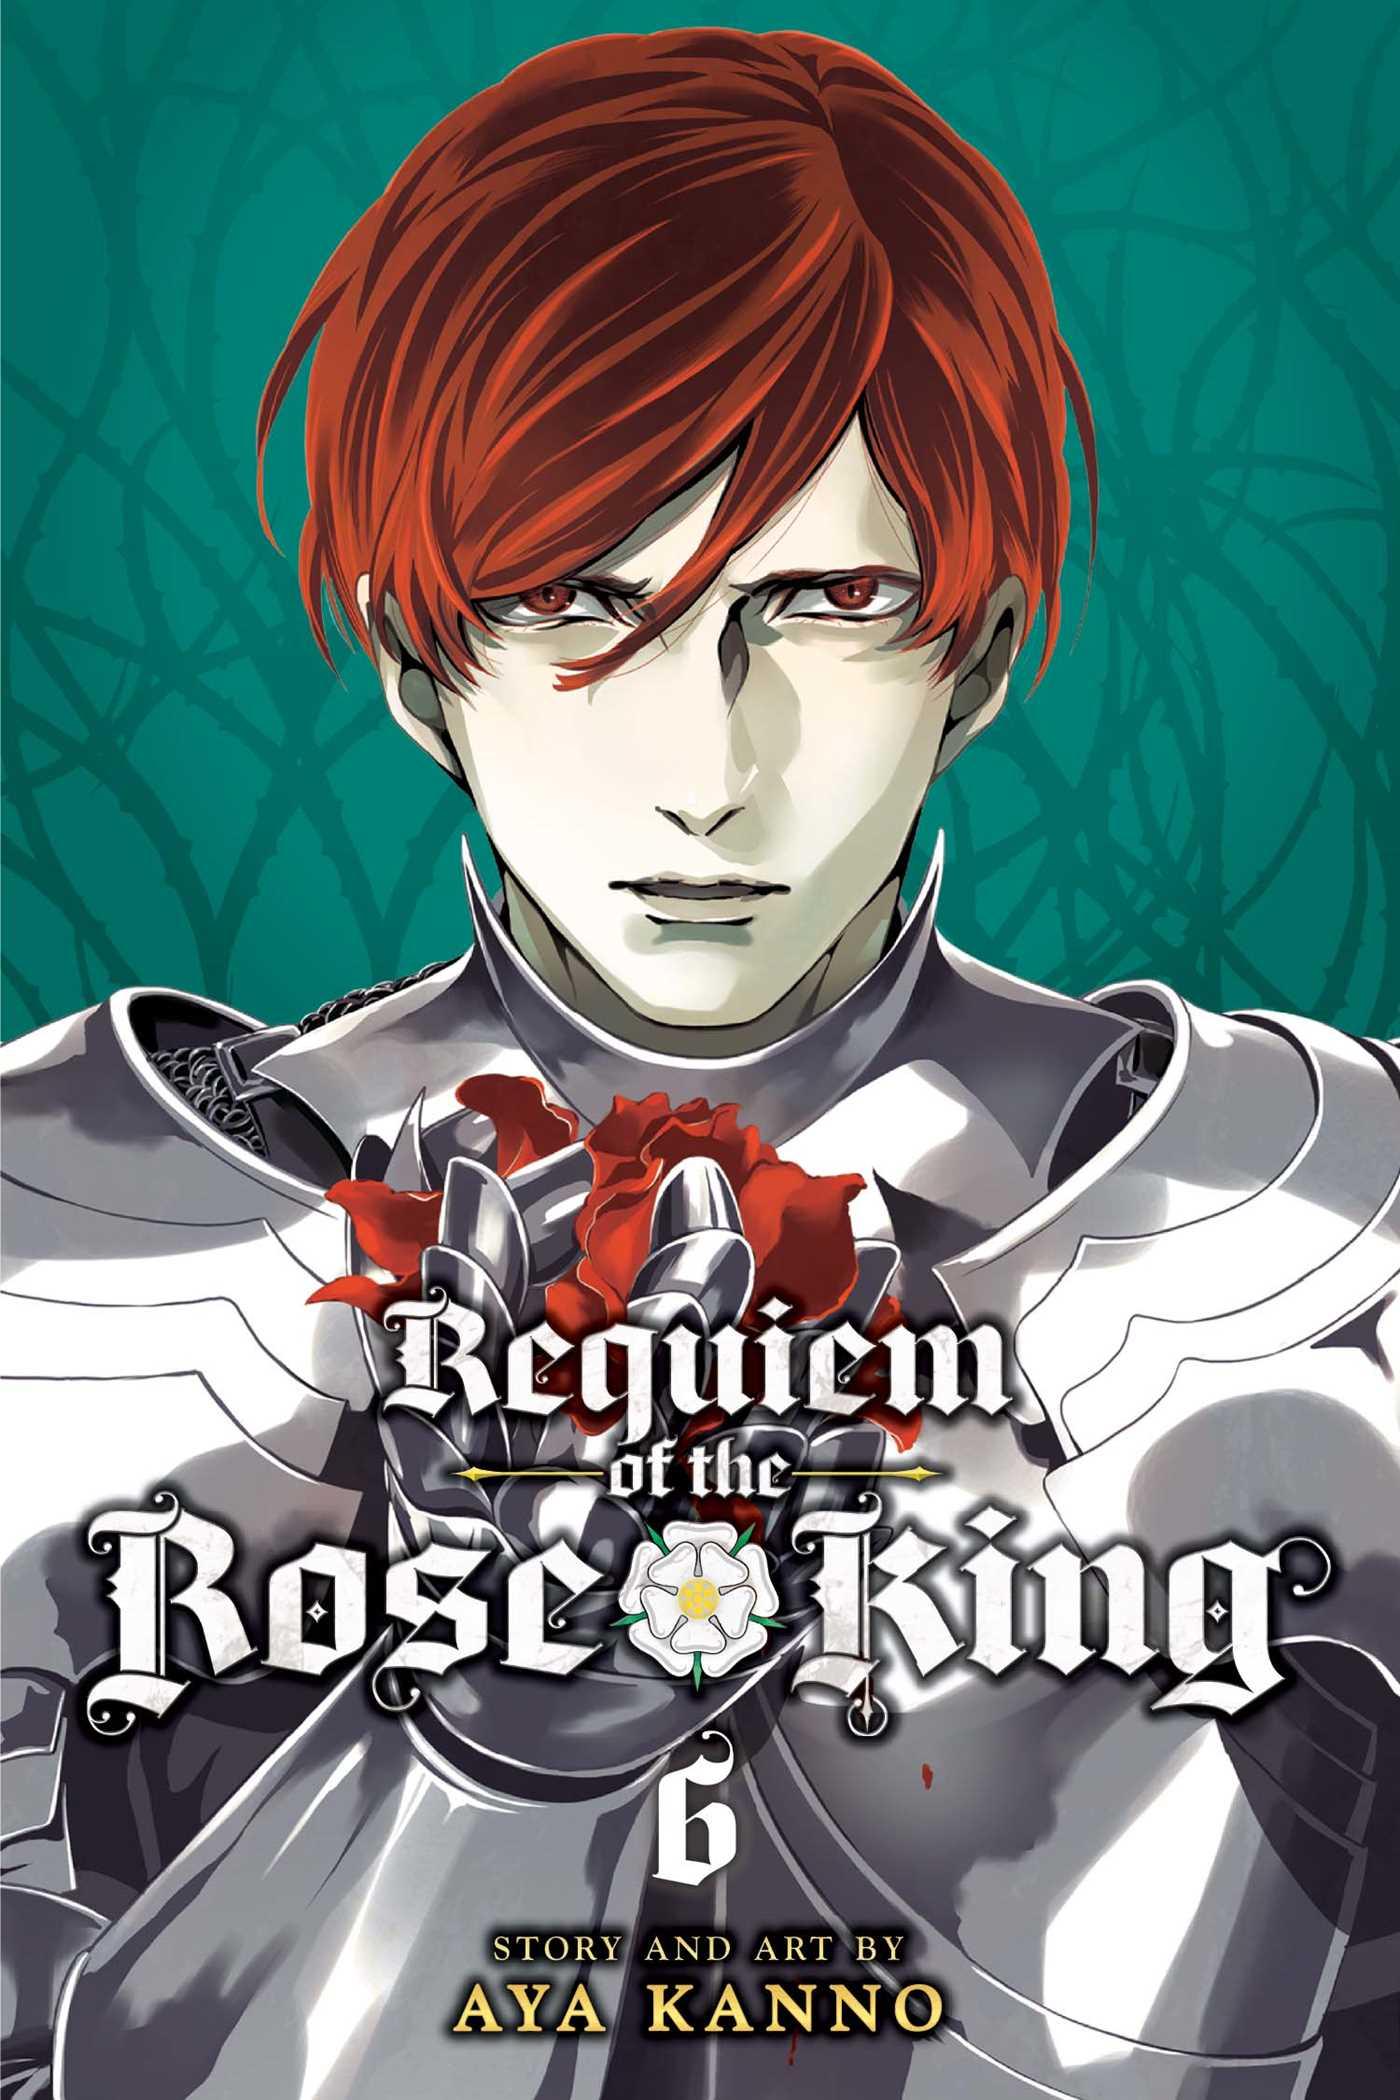 Requiem of the rose king vol 6 9781421592688 hr